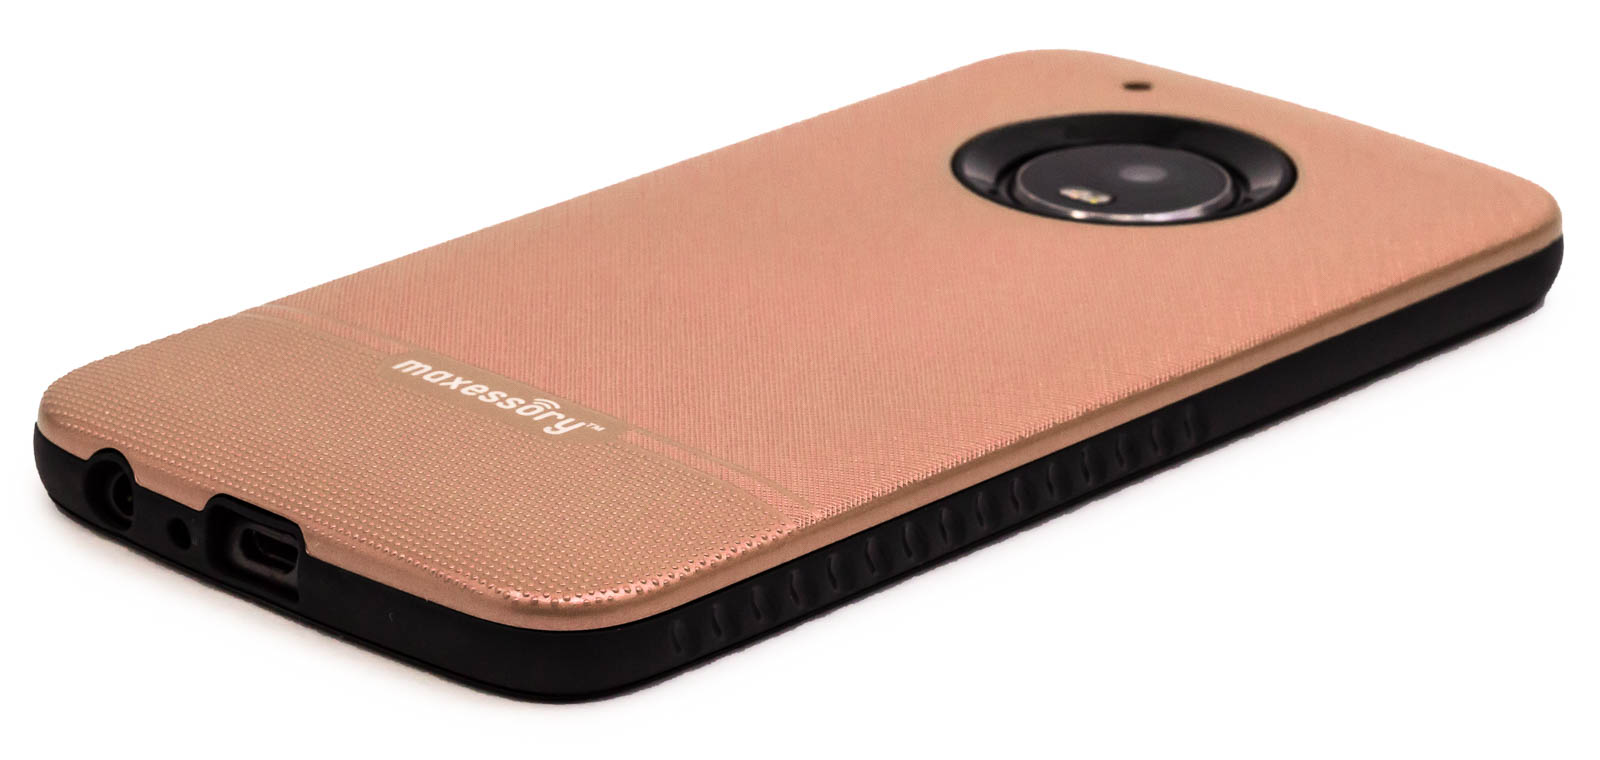 Moto-G5-Plus-Case-Moto-X-17-Case-Ultra-Thin-Hard-Body-Tactile-Shell-Cover thumbnail 40